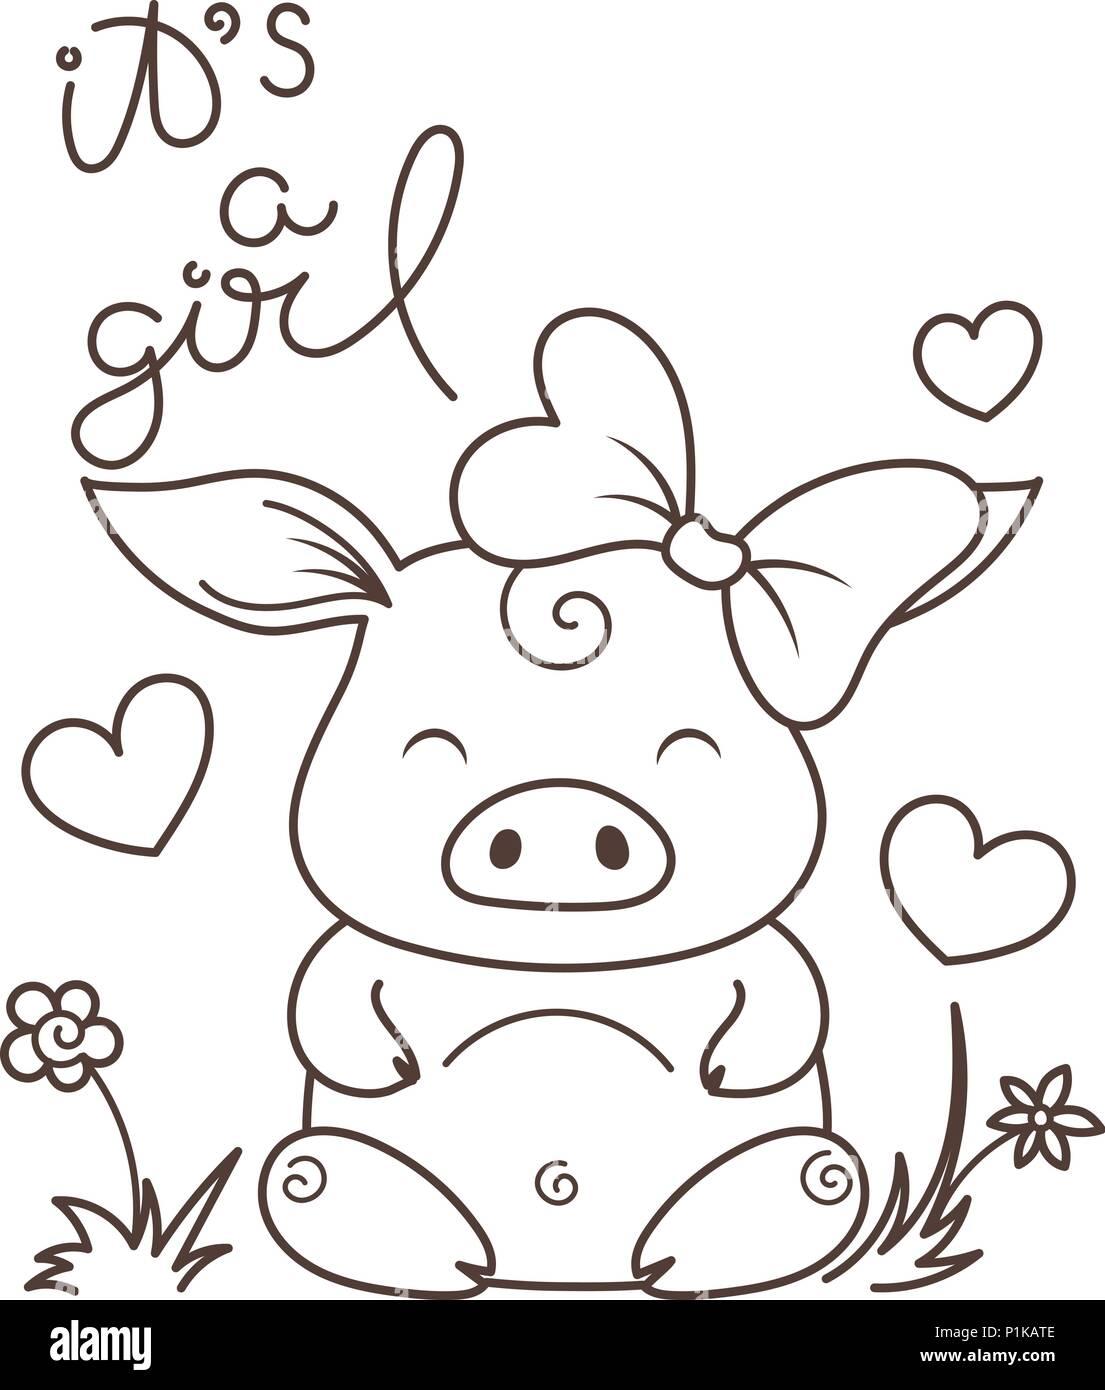 Cartoon Illustration Little Pig Sitting Imágenes De Stock & Cartoon ...